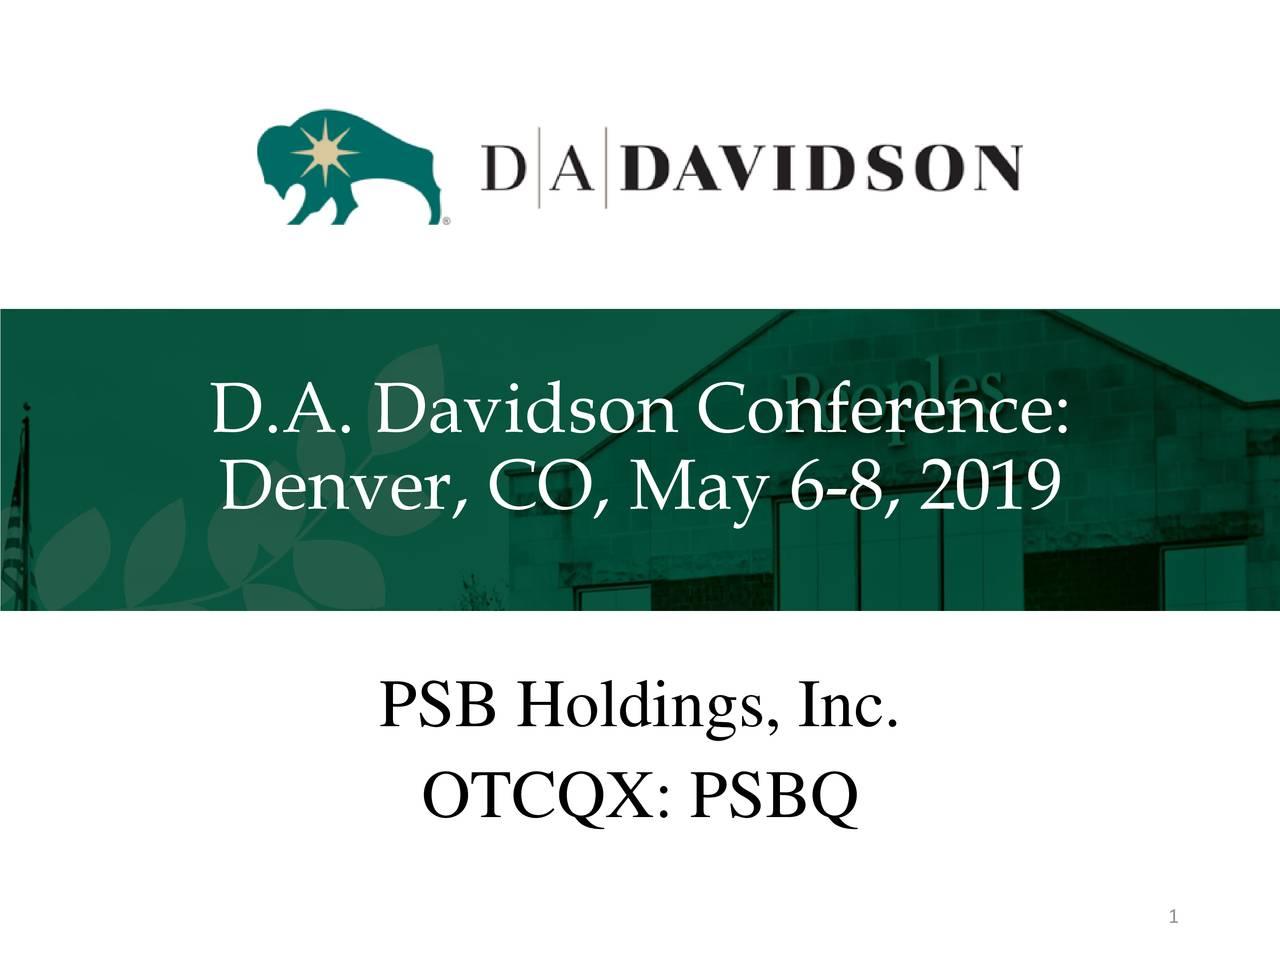 Denver, CO, May 6-8, 2019 PSB Holdings, Inc. OTCQX: PSBQ 1